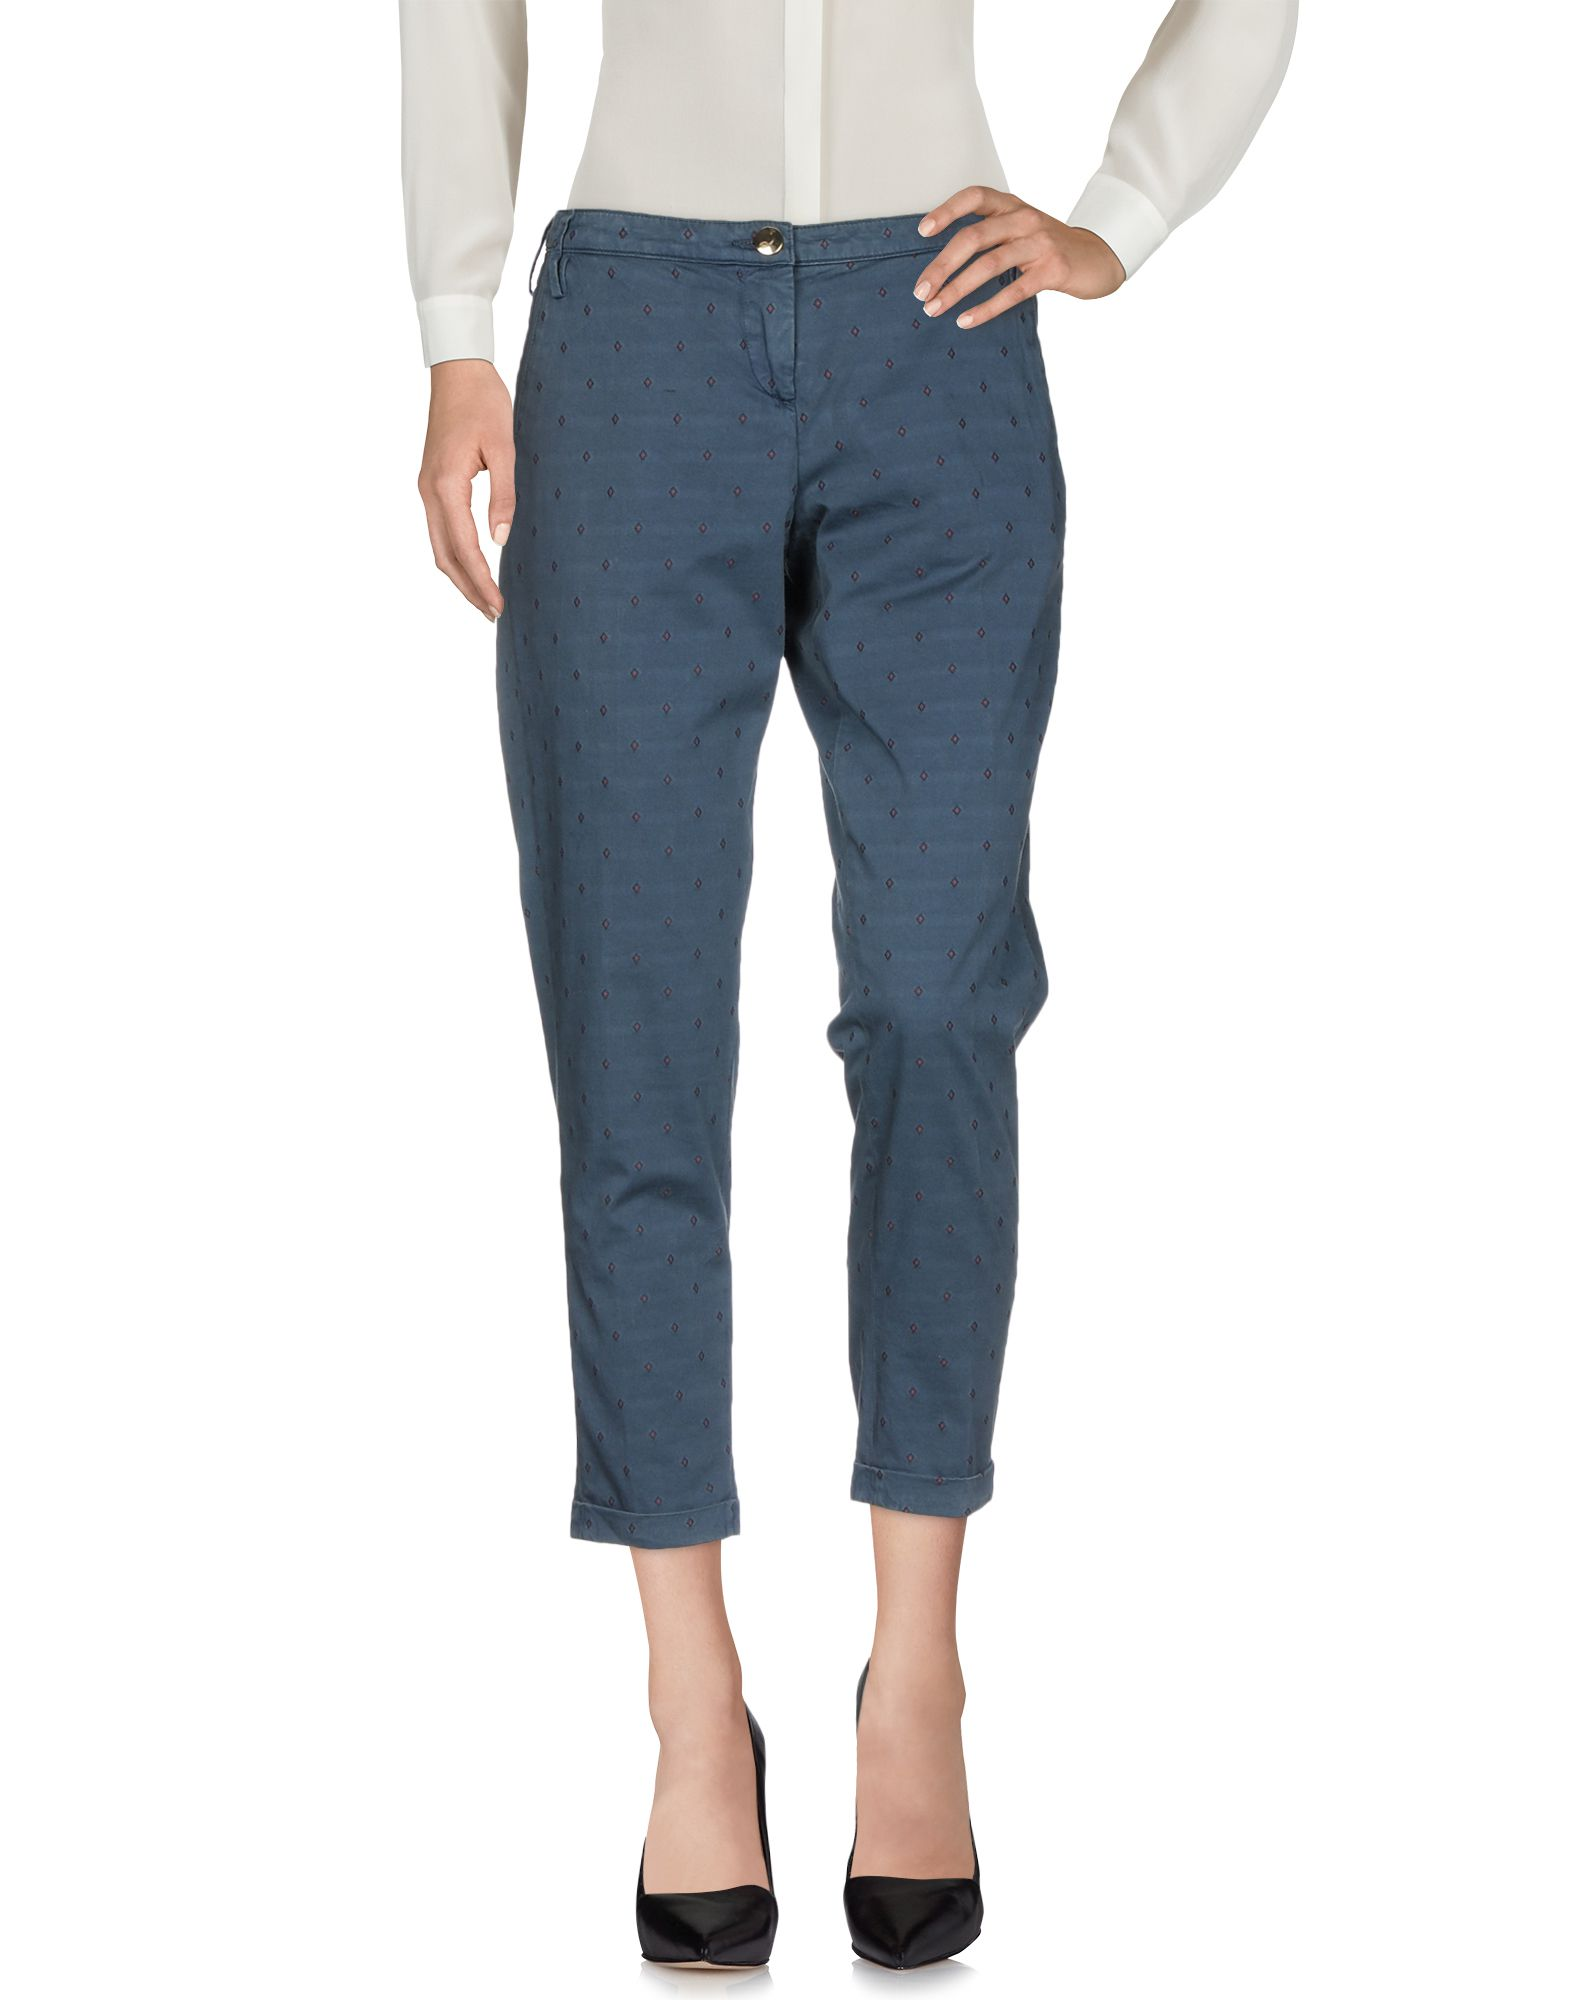 Pantalone Jacob Cohёn Donna - Acquista online su 682sOU2Ui4